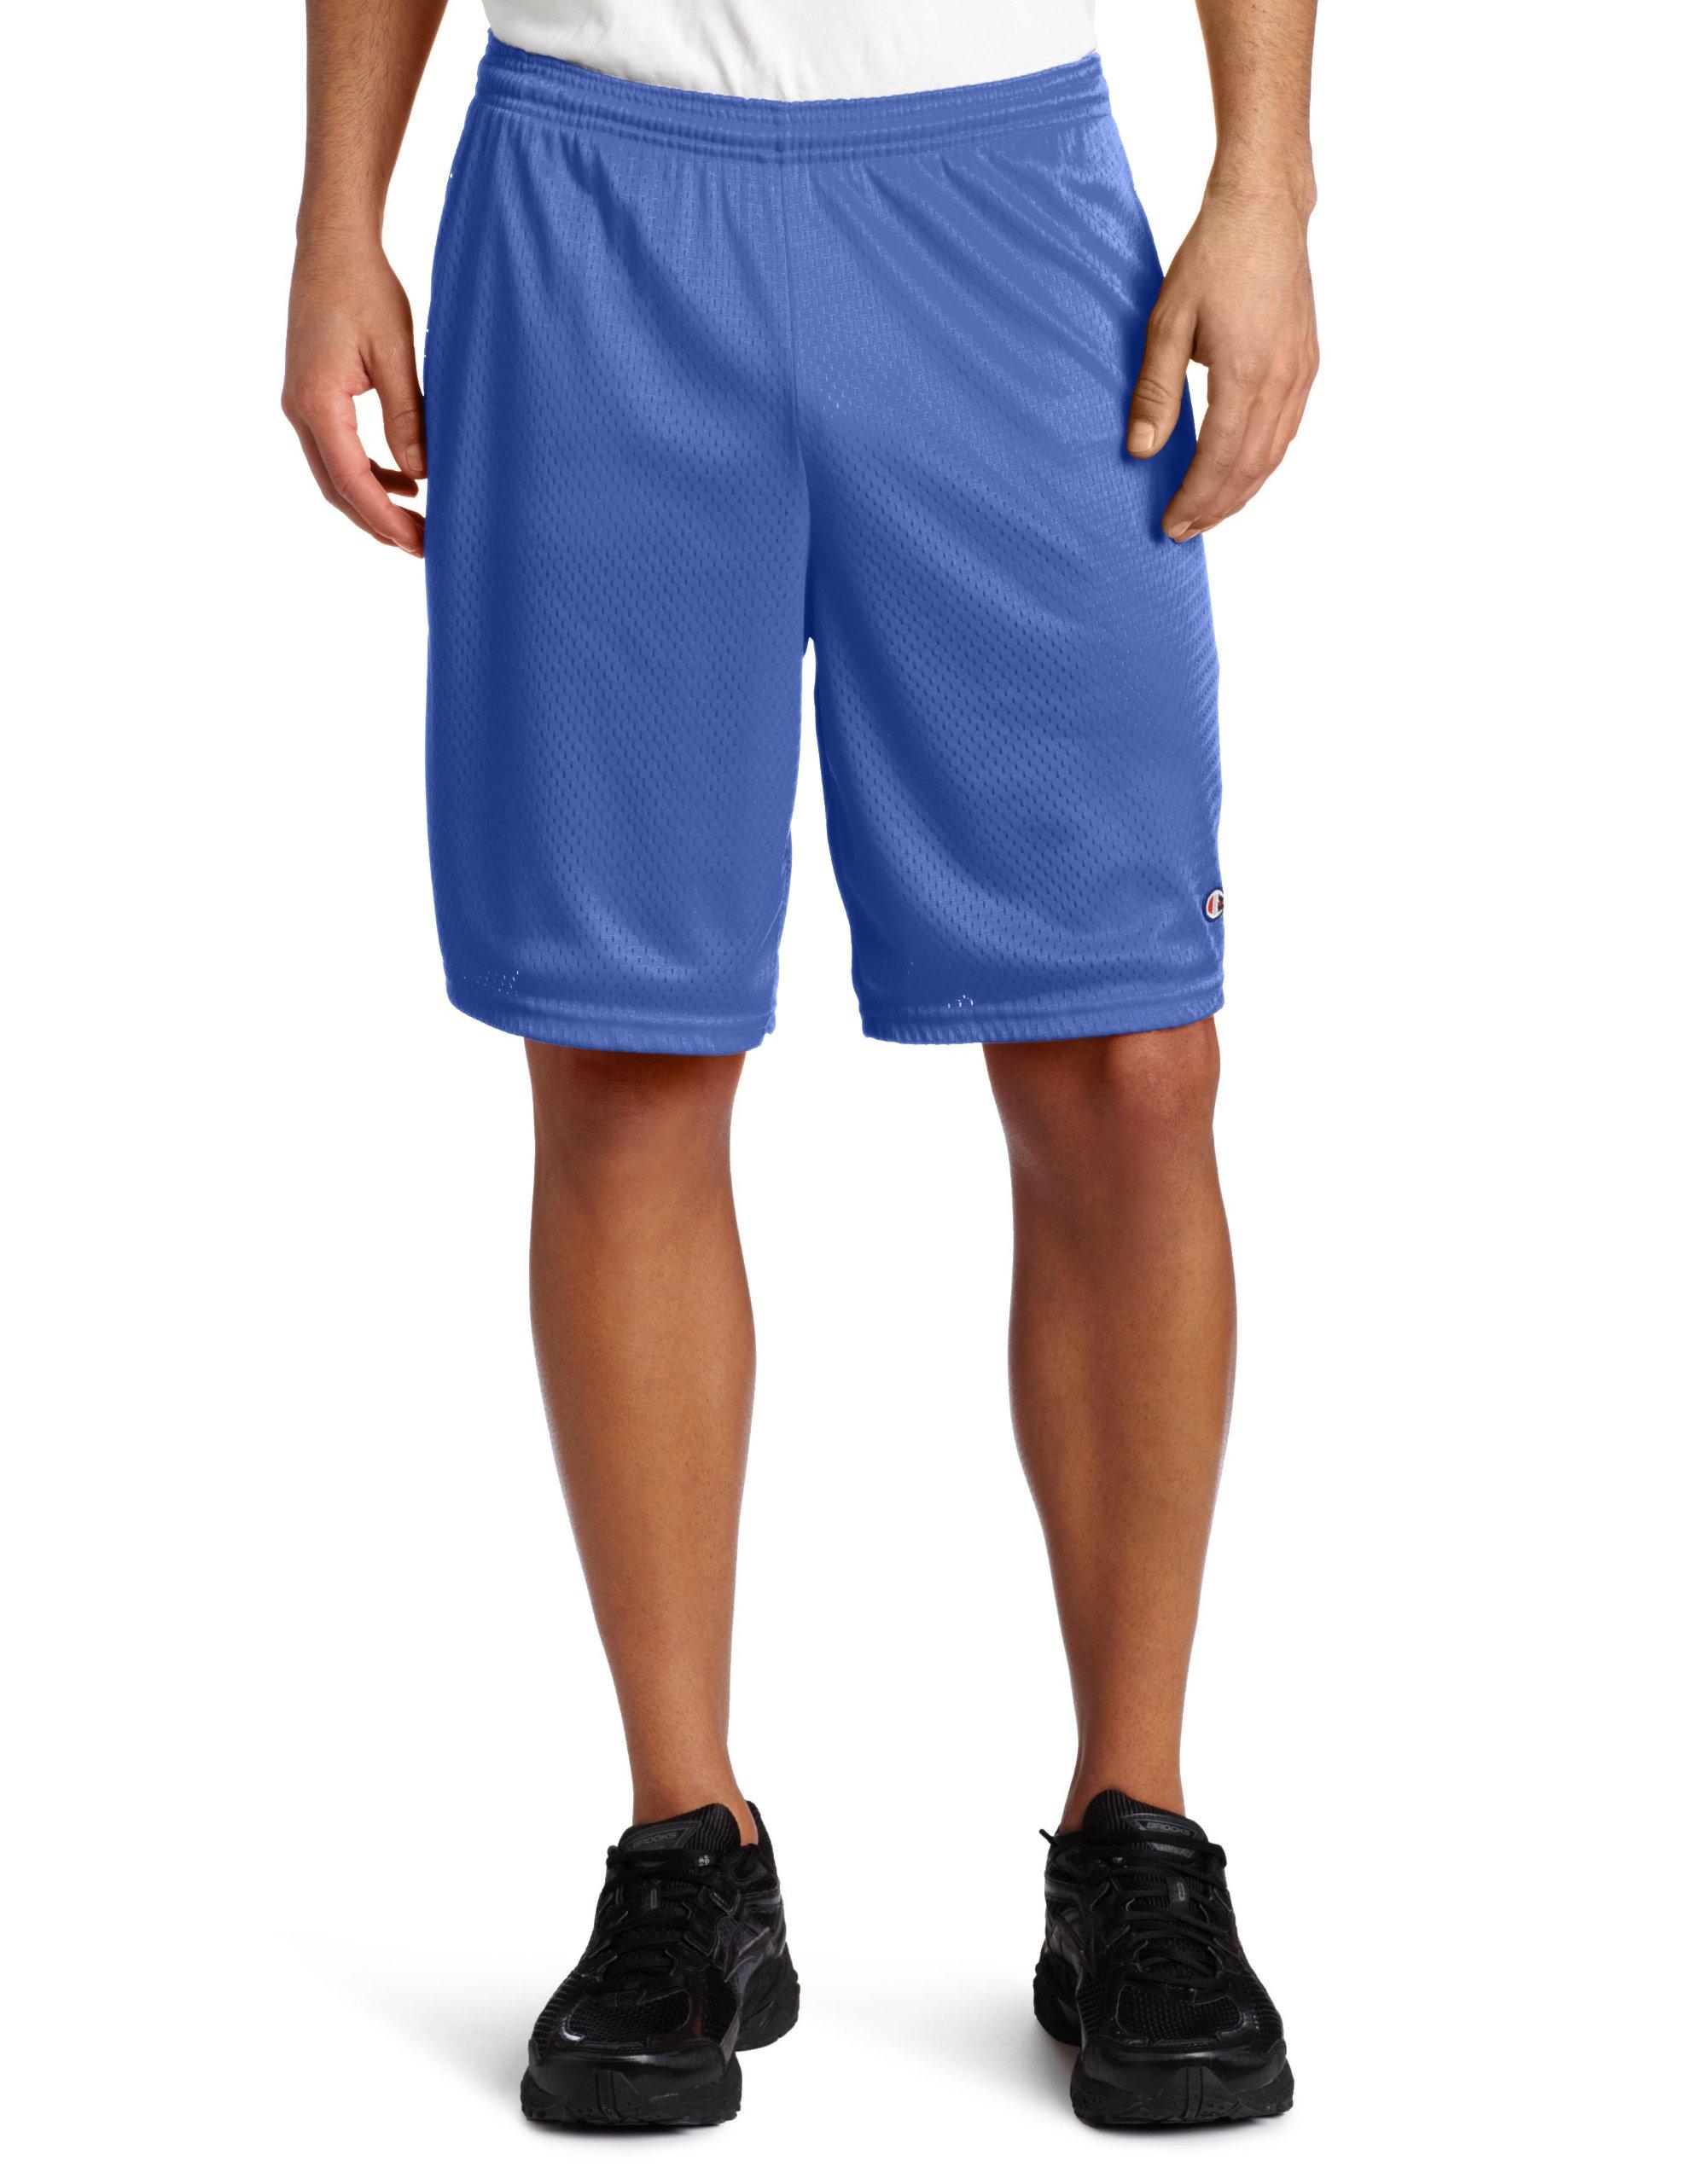 Champion Men's Long Mesh Short with Pockets,North